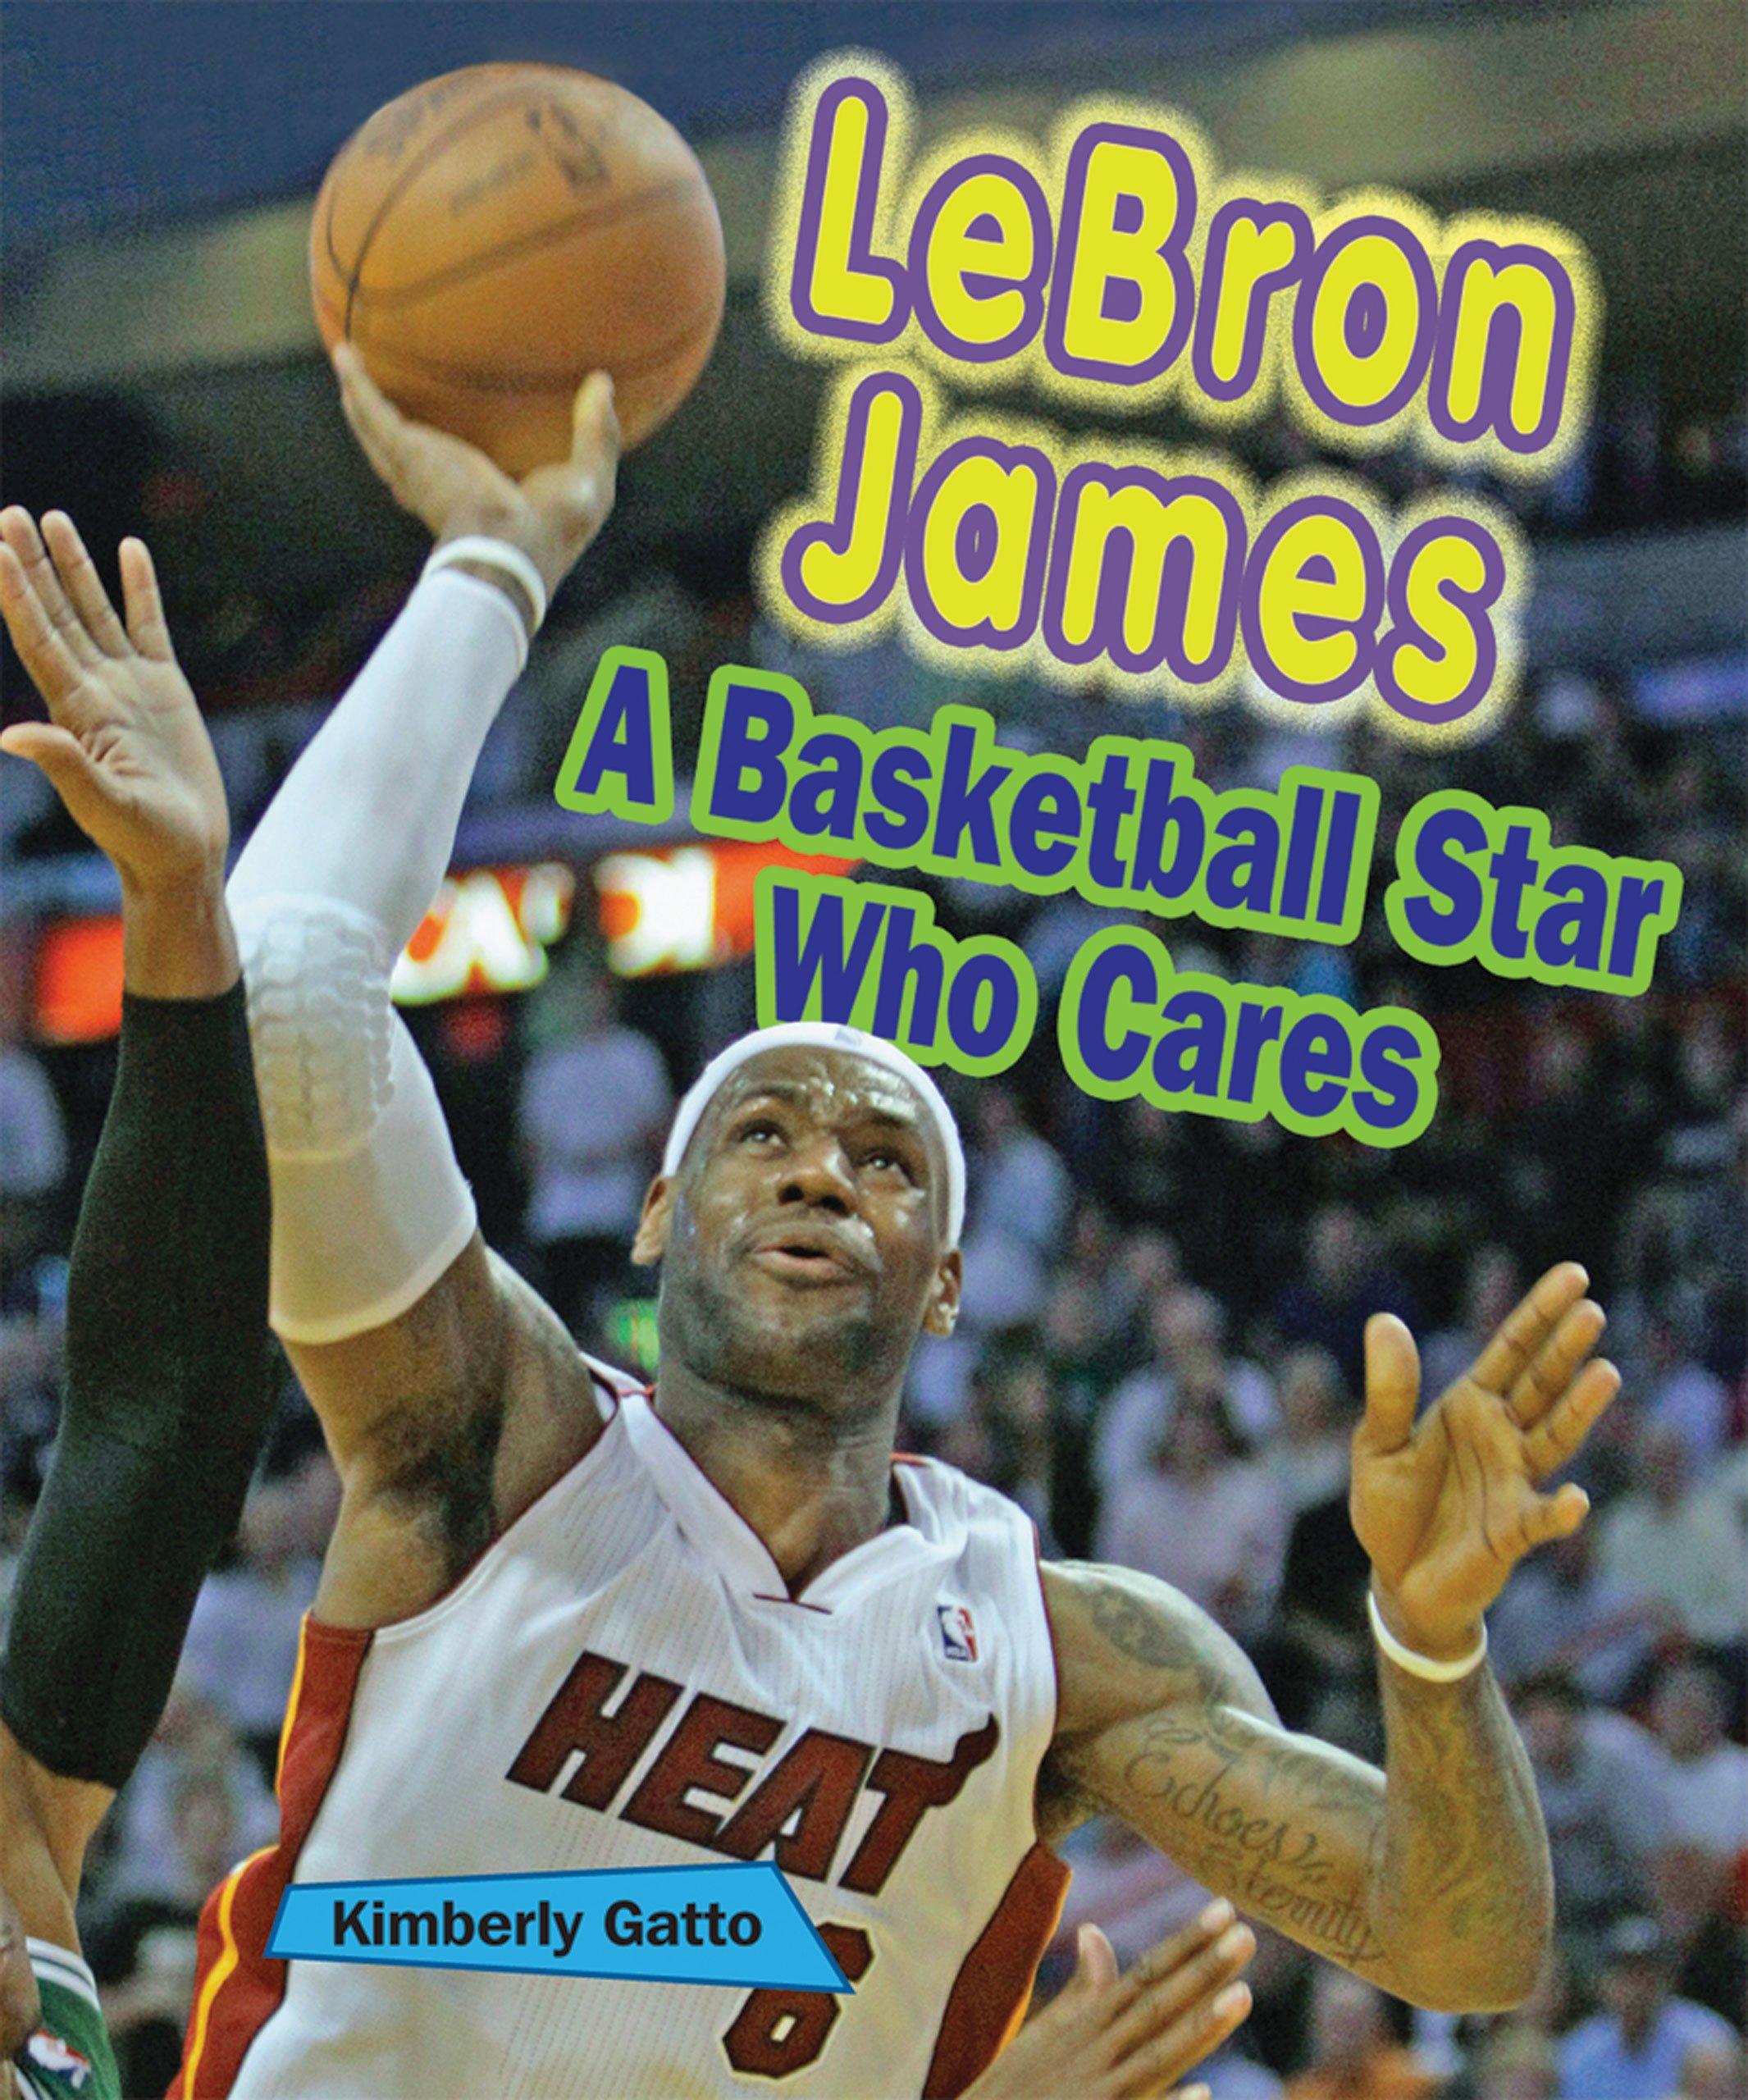 Download Lebron James: A Basketball Star Who Cares (Sports Stars Who Care) pdf epub